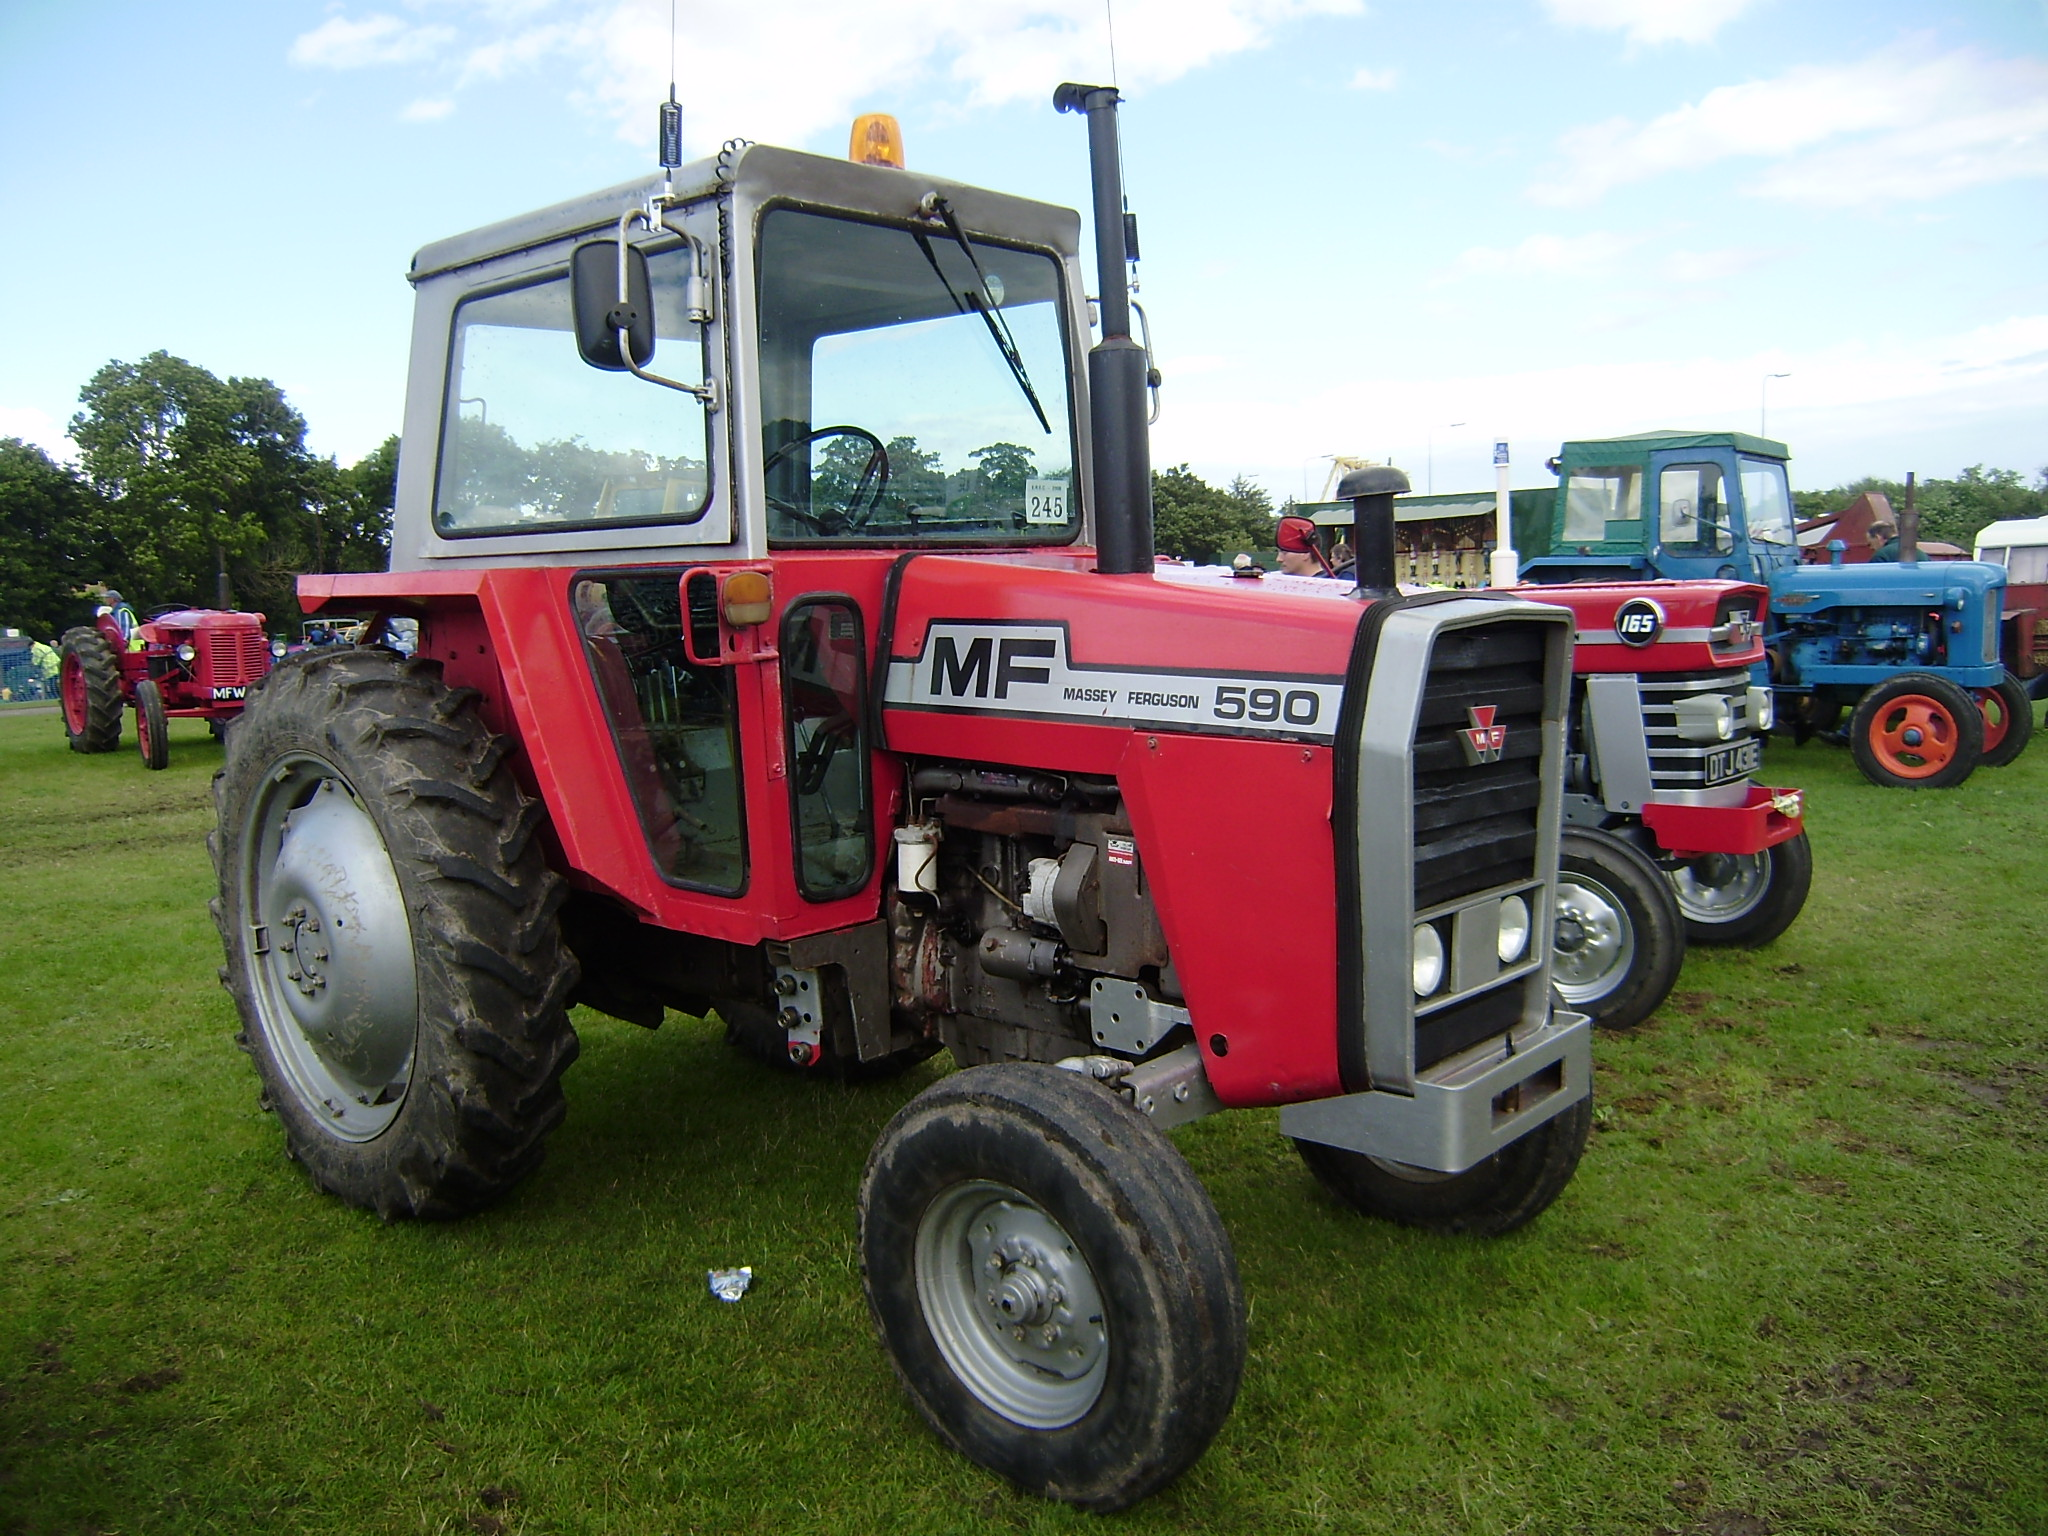 massey ferguson 590 tractor construction plant wiki fandom rh tractors wikia com massey ferguson 590 service manual Massey Ferguson Operators Manual